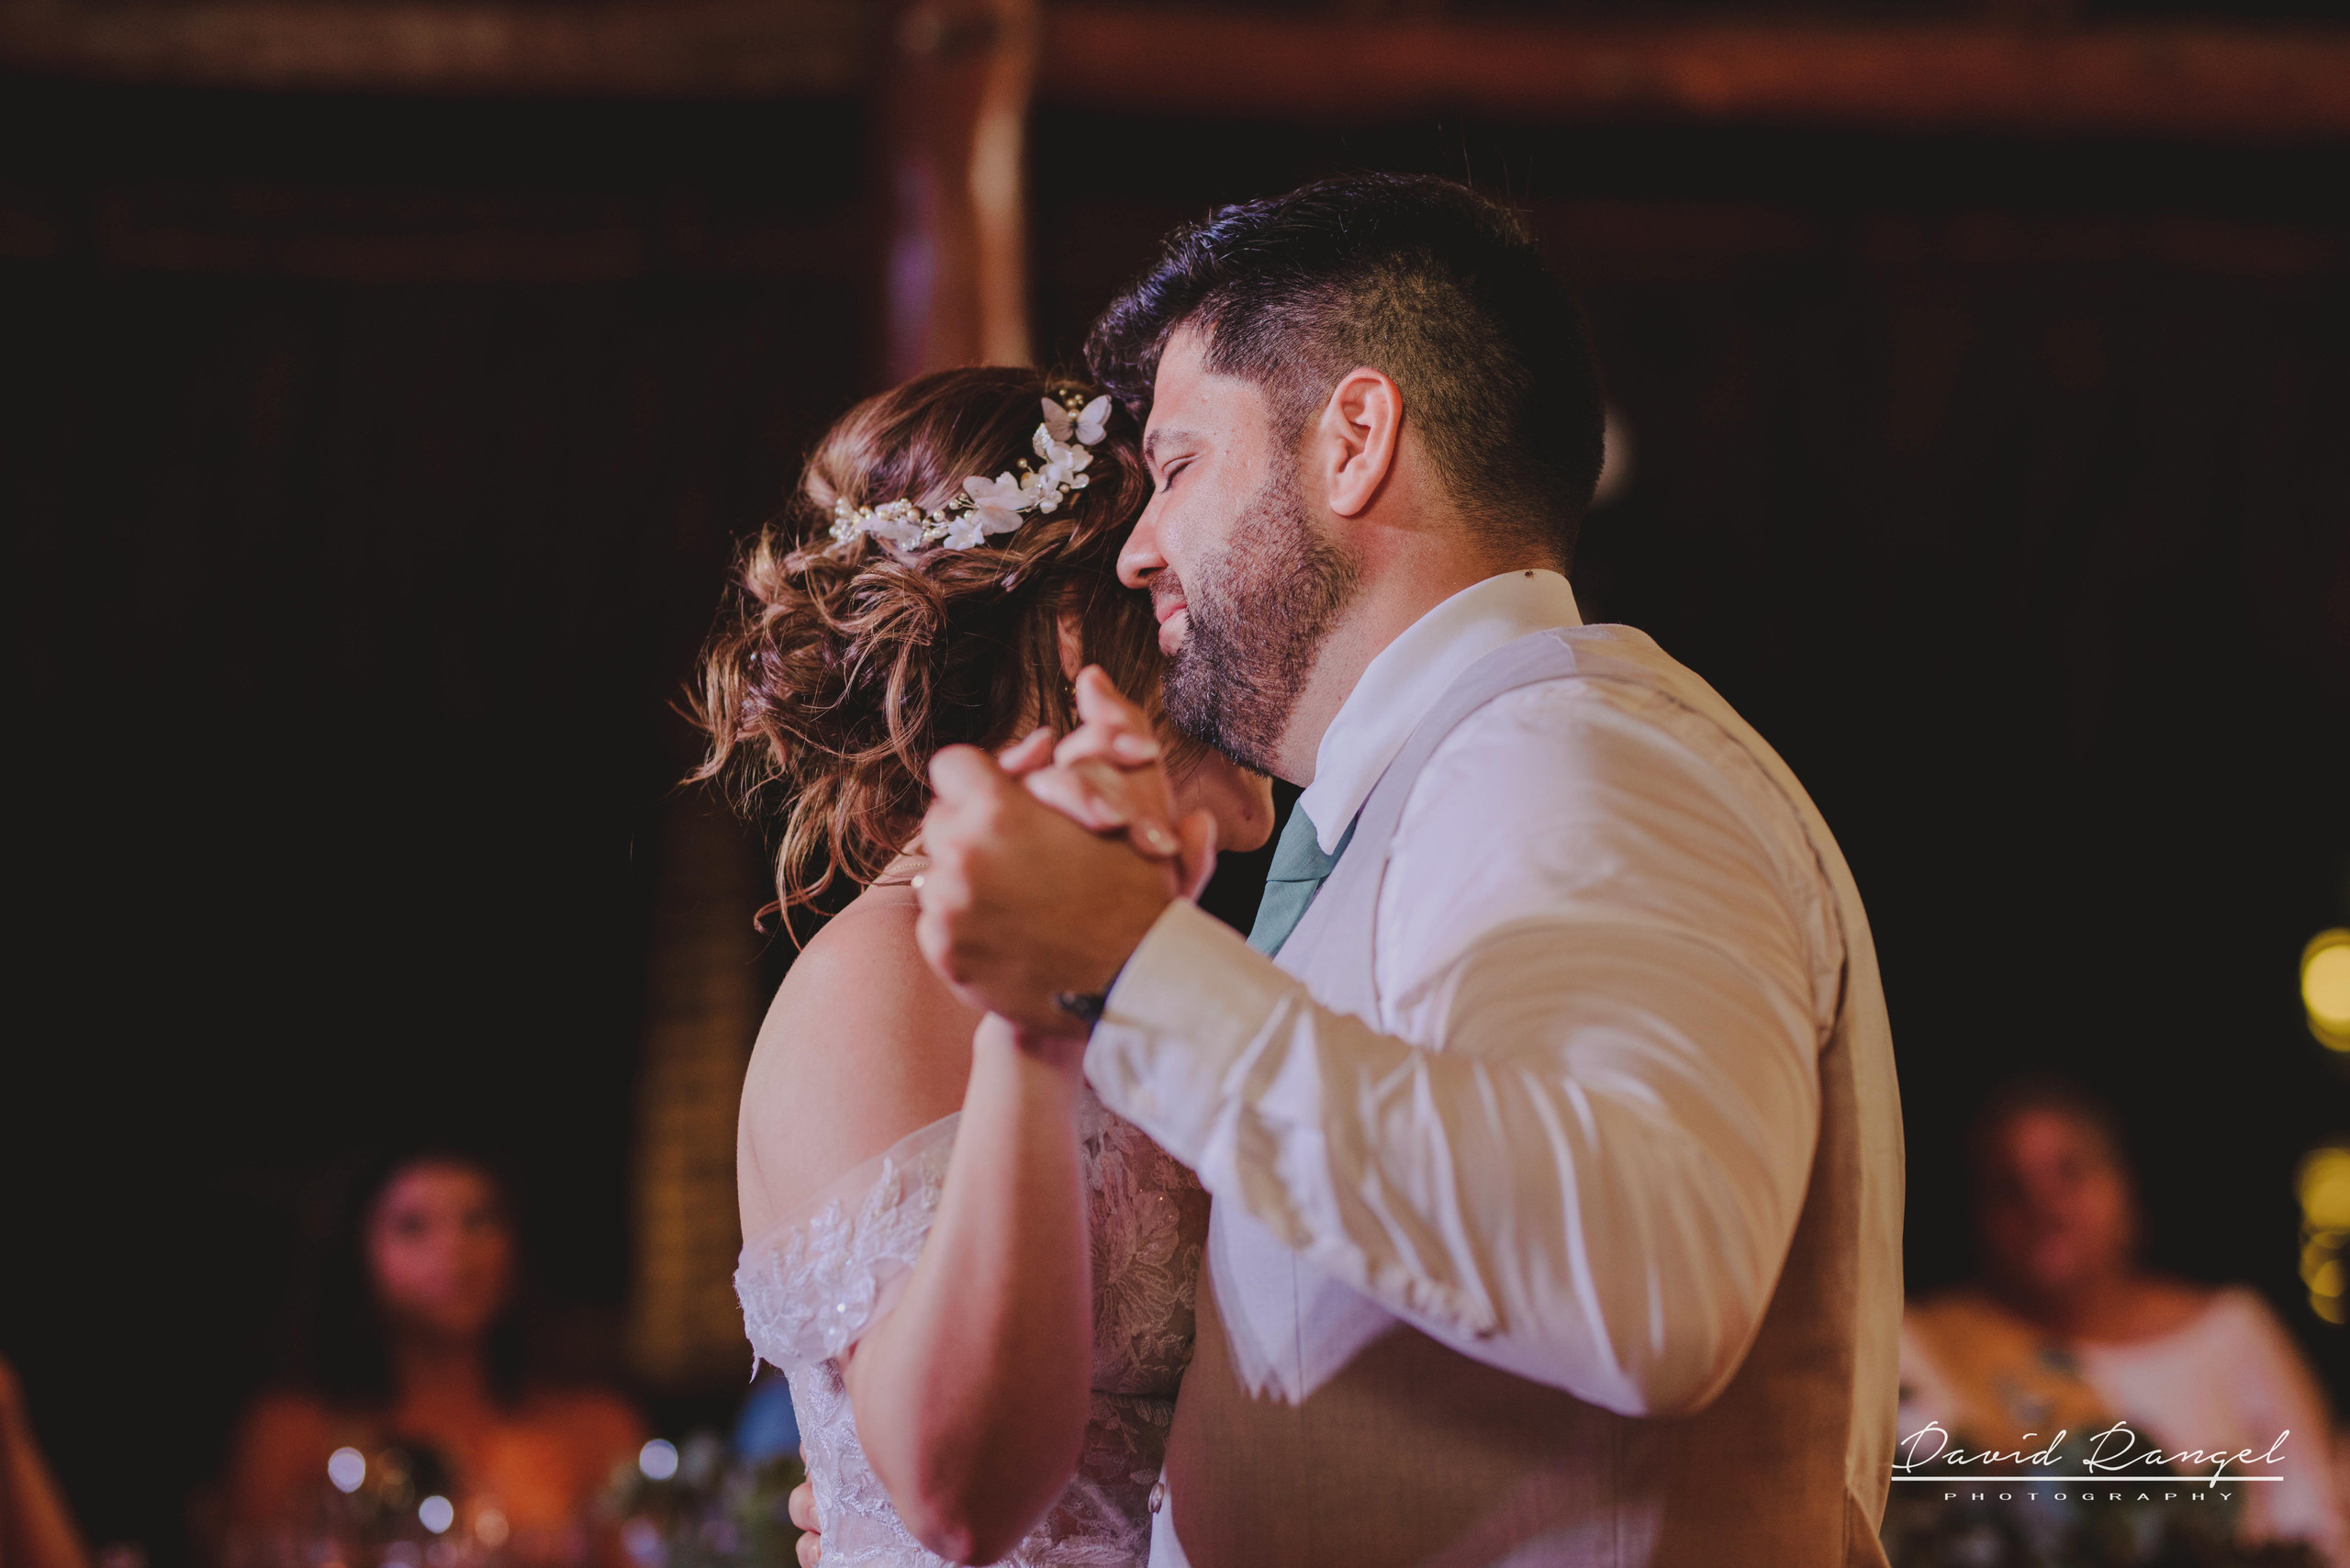 bride+groom+beach+session+happy+love+couple+celebration+wedding+photo+beach+caribean+sea+photographer+david+rangel+dress+suit+villa+chenera+maain+entrance+reception+first+dance+hugh